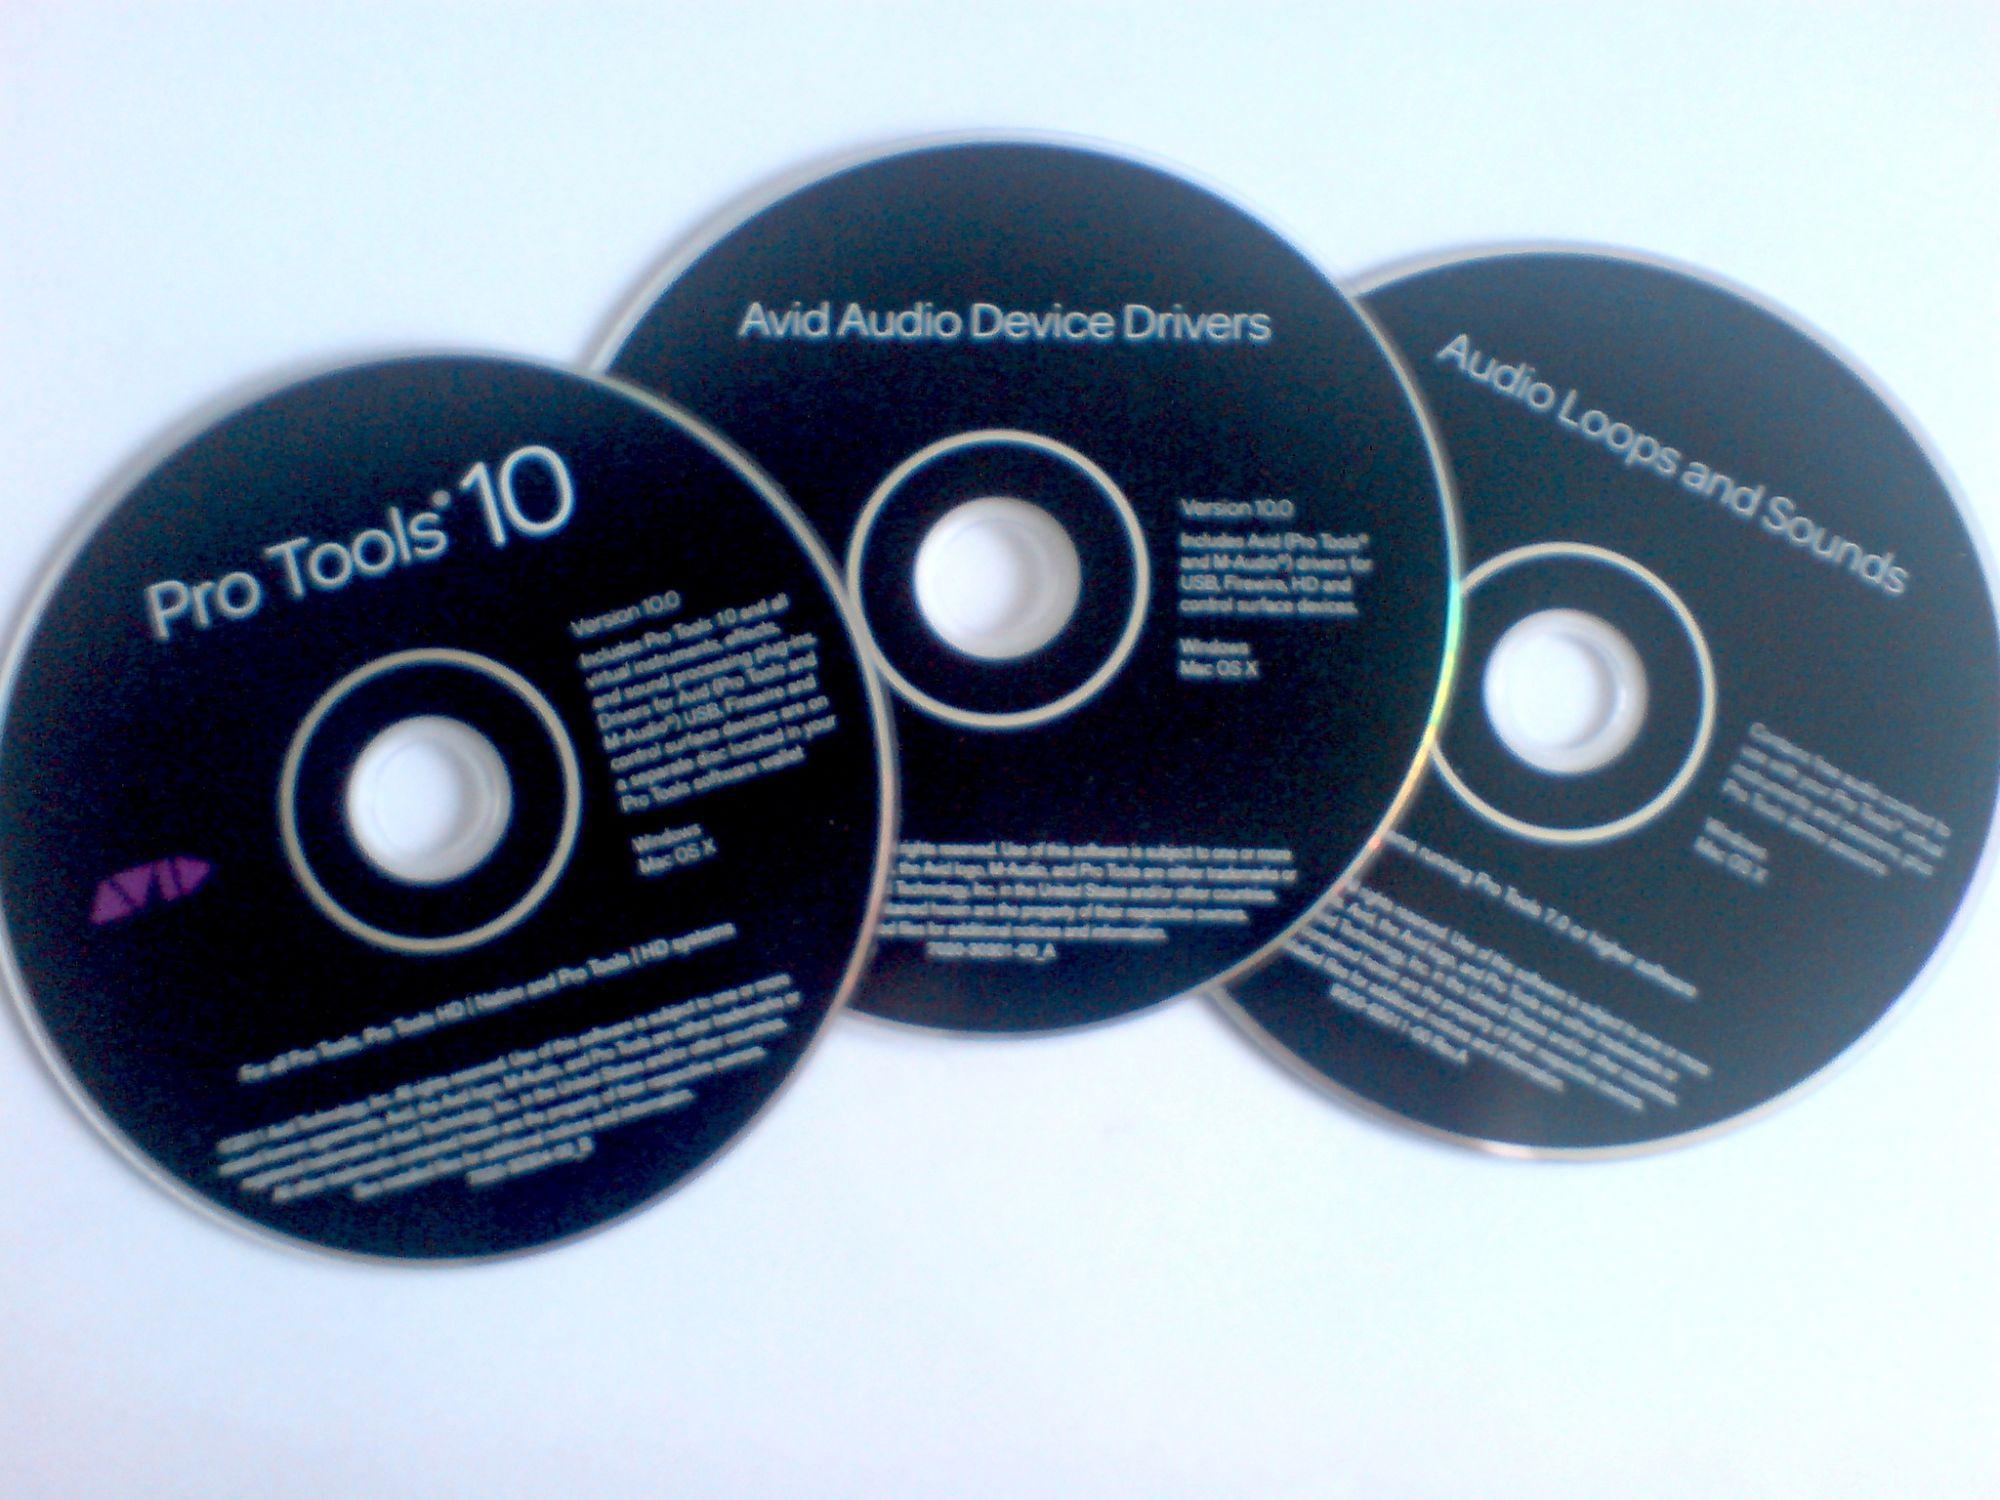 Test: Avid, Pro Tools 10, DAW - AMAZONA de